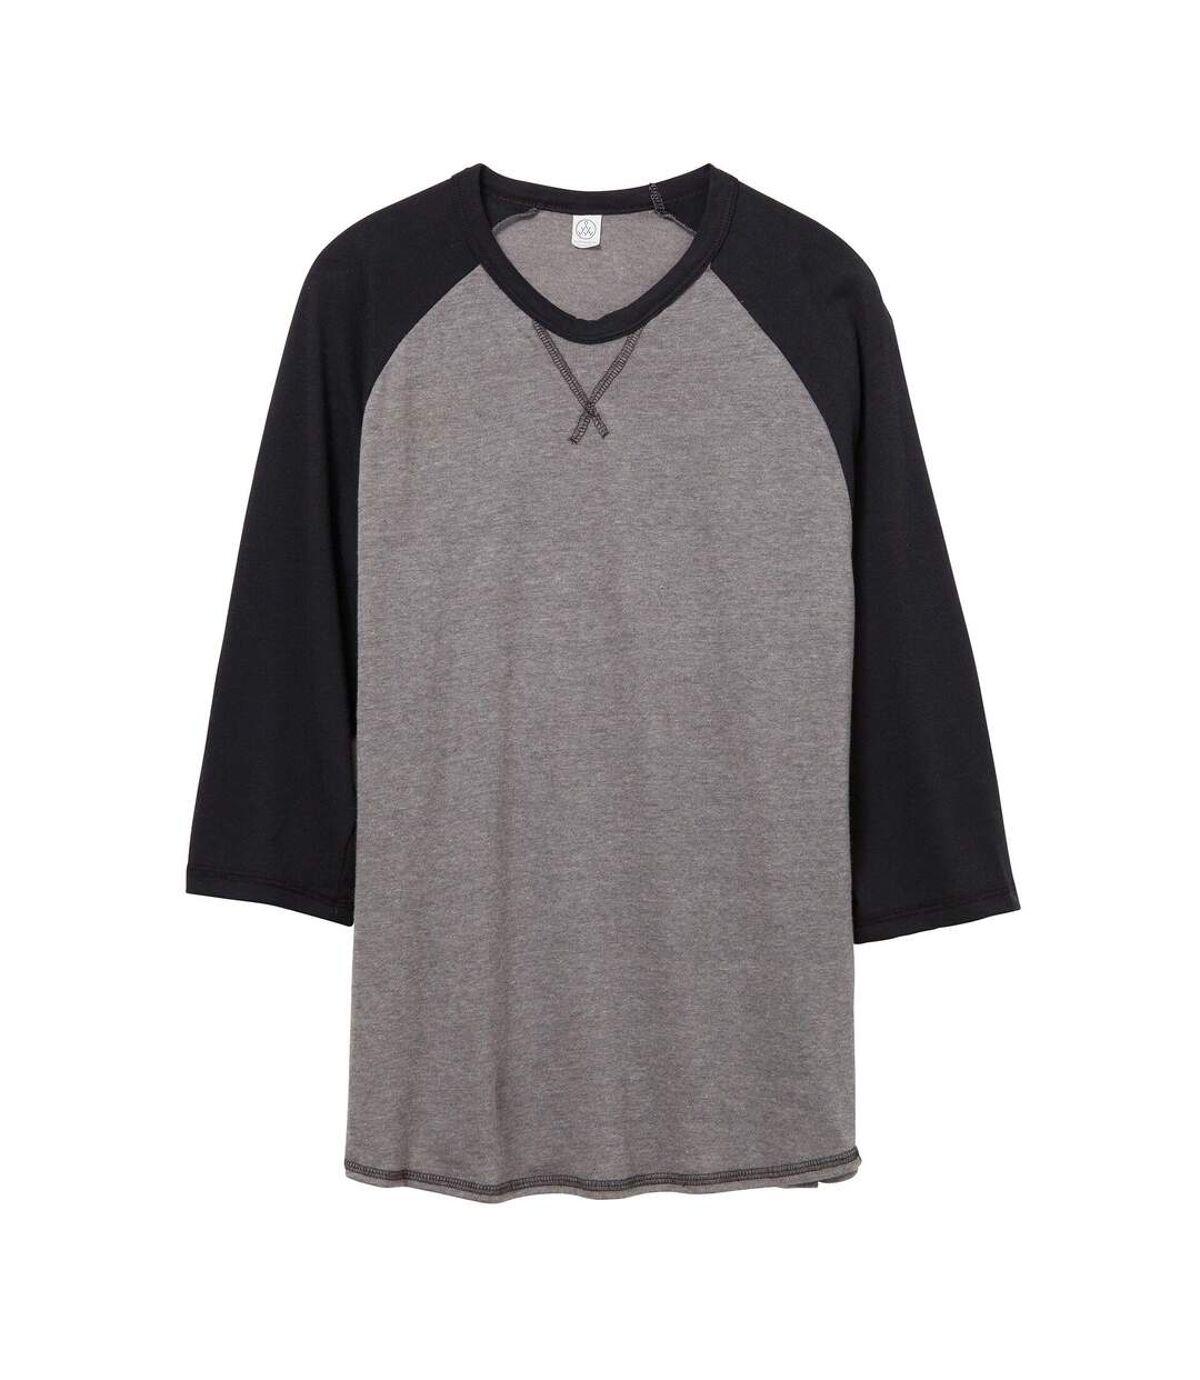 Alternative Apparel Mens Dugout Vintage 50/50 T-shirt (Vintage Coal/Black) - UTRW6010